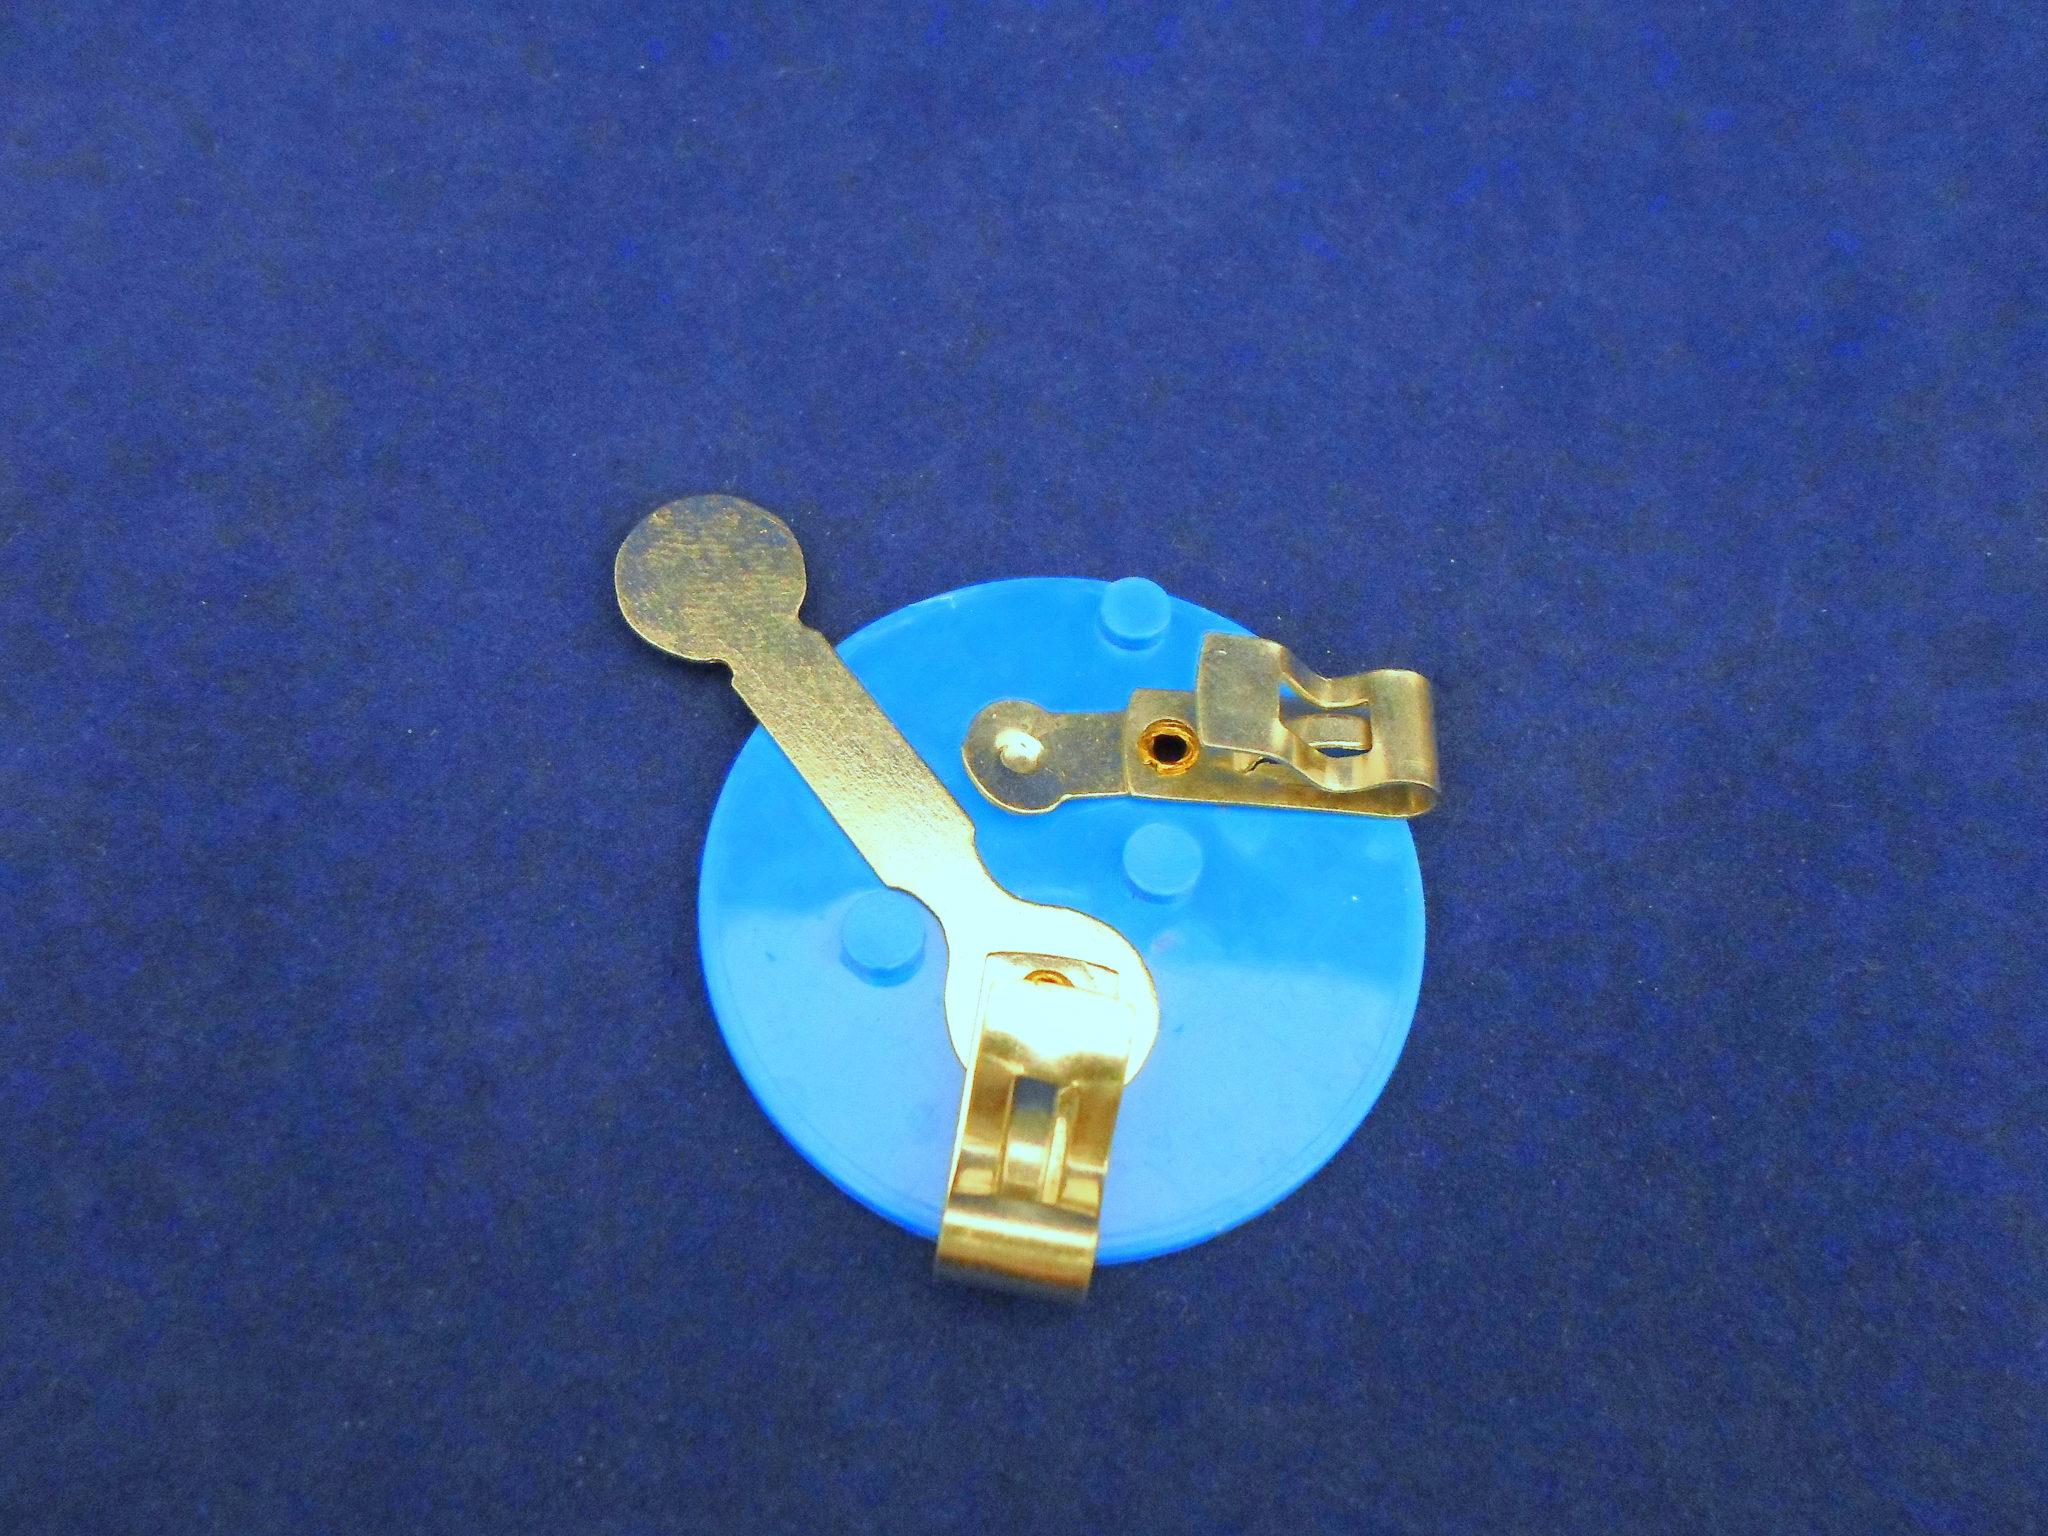 Ajax Scientific EL100-0001 Bulb Holder with Fahnstock Clip 55 mm Diameter